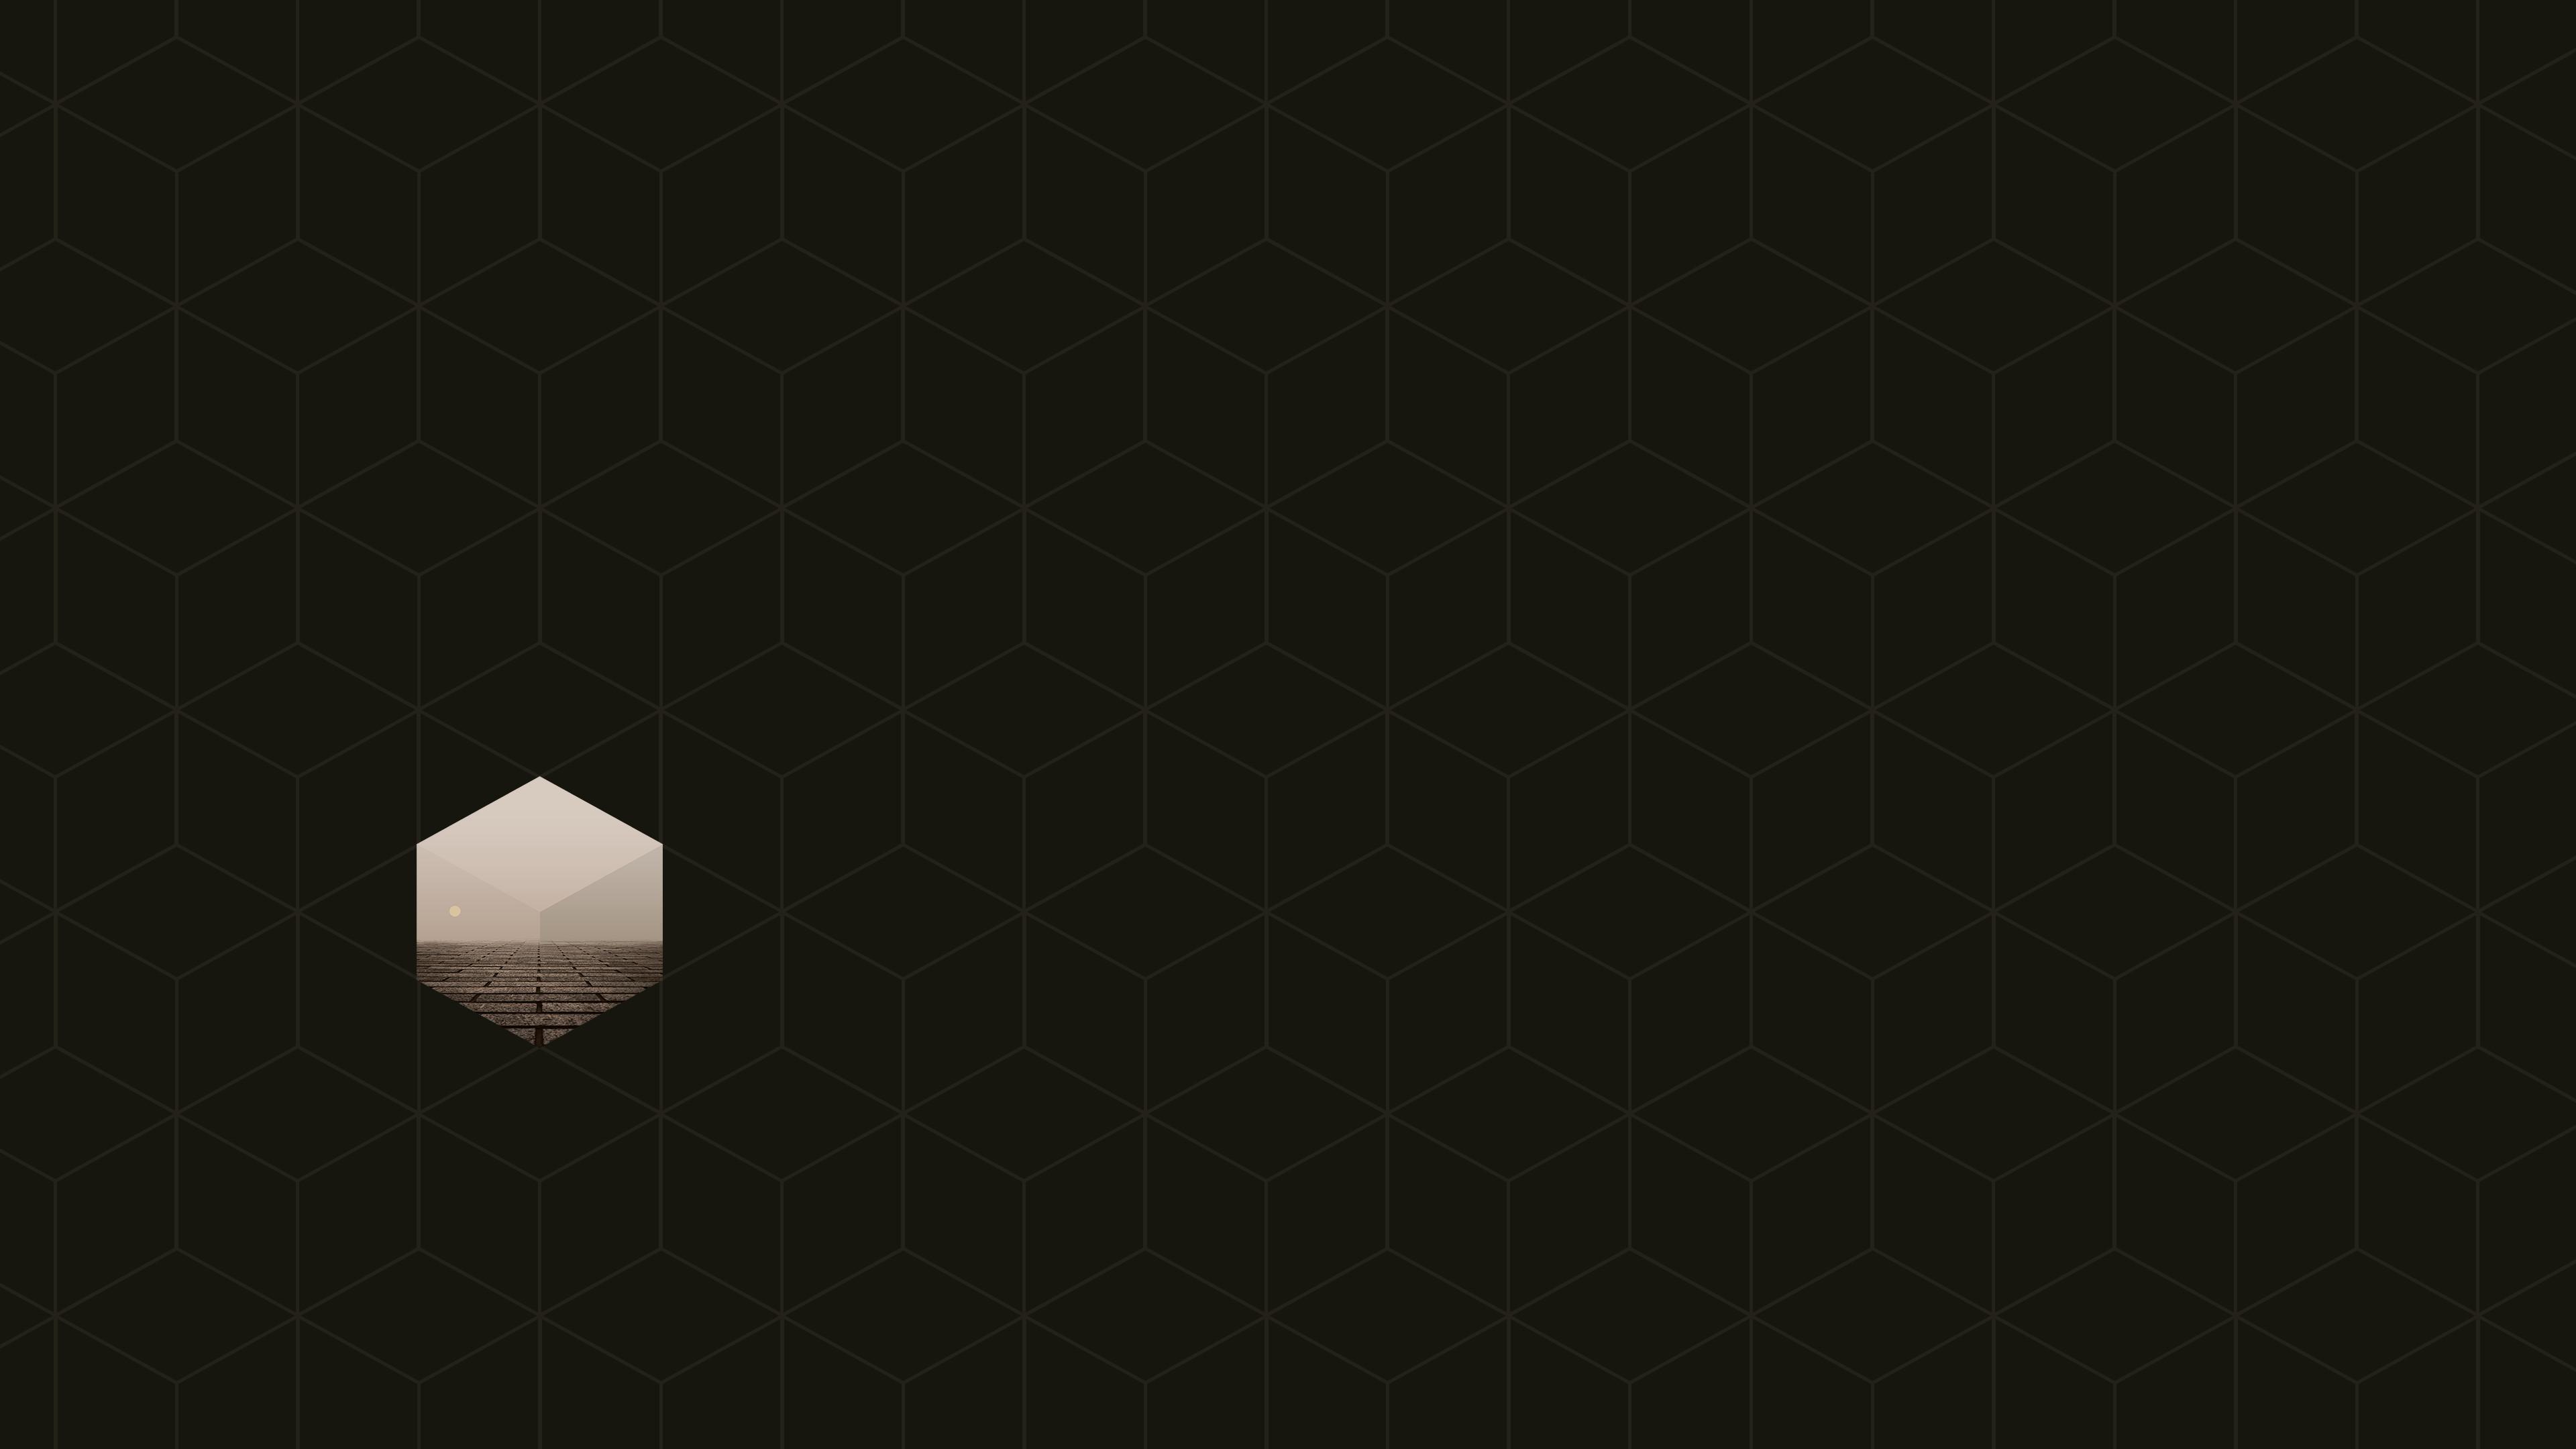 Earth Prism: 4k ready sacred geometry wallpaper set. [OC] [3840 × 2160]